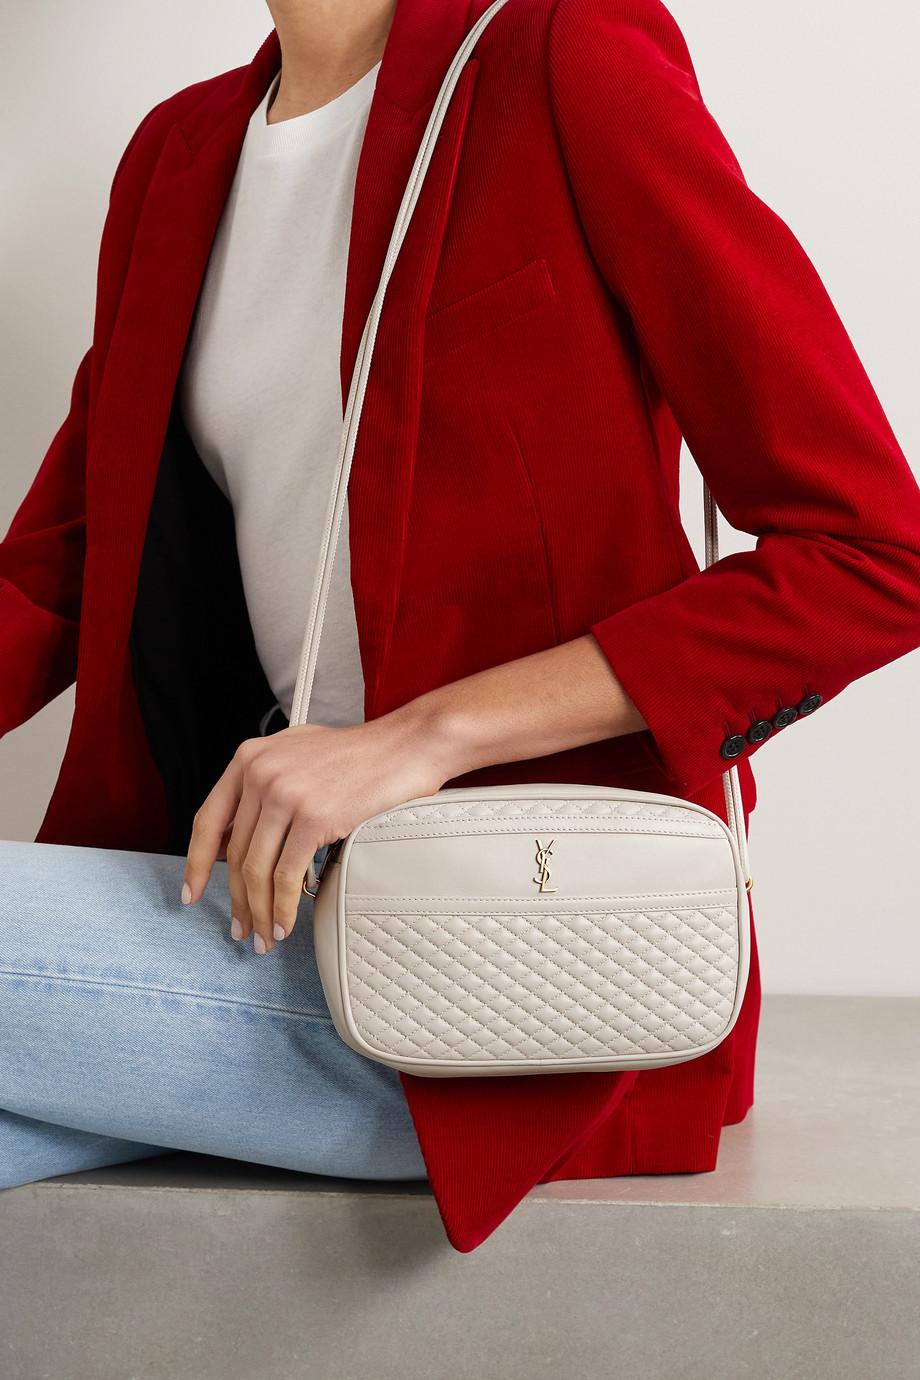 SAINT LAURENT Victoire quilted leather shoulder bag